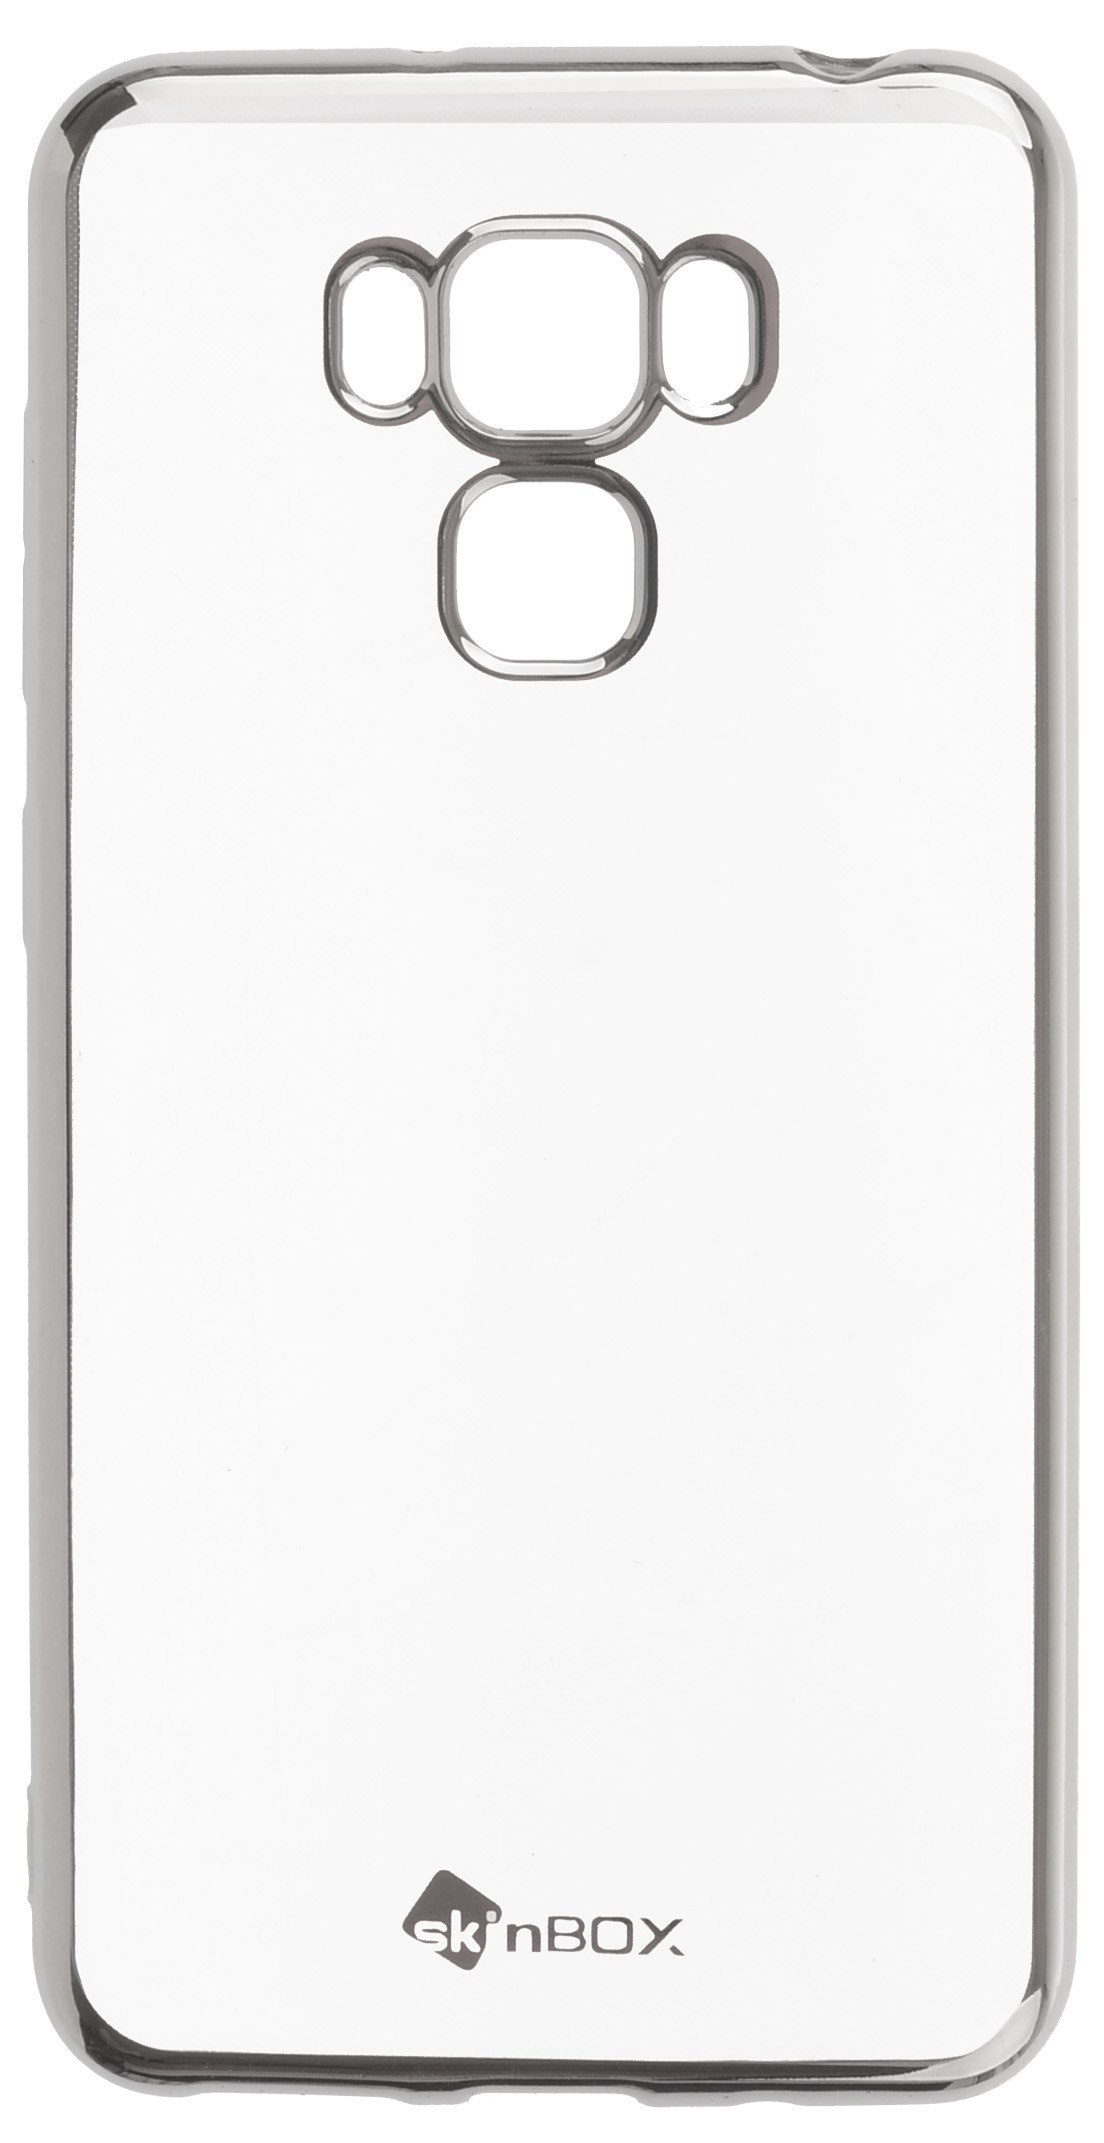 Чехол для сотового телефона skinBOX Silicone chrome border, 4660041408362, серебристый чехол для сотового телефона skinbox silicone chrome border 4630042528697 серебристый